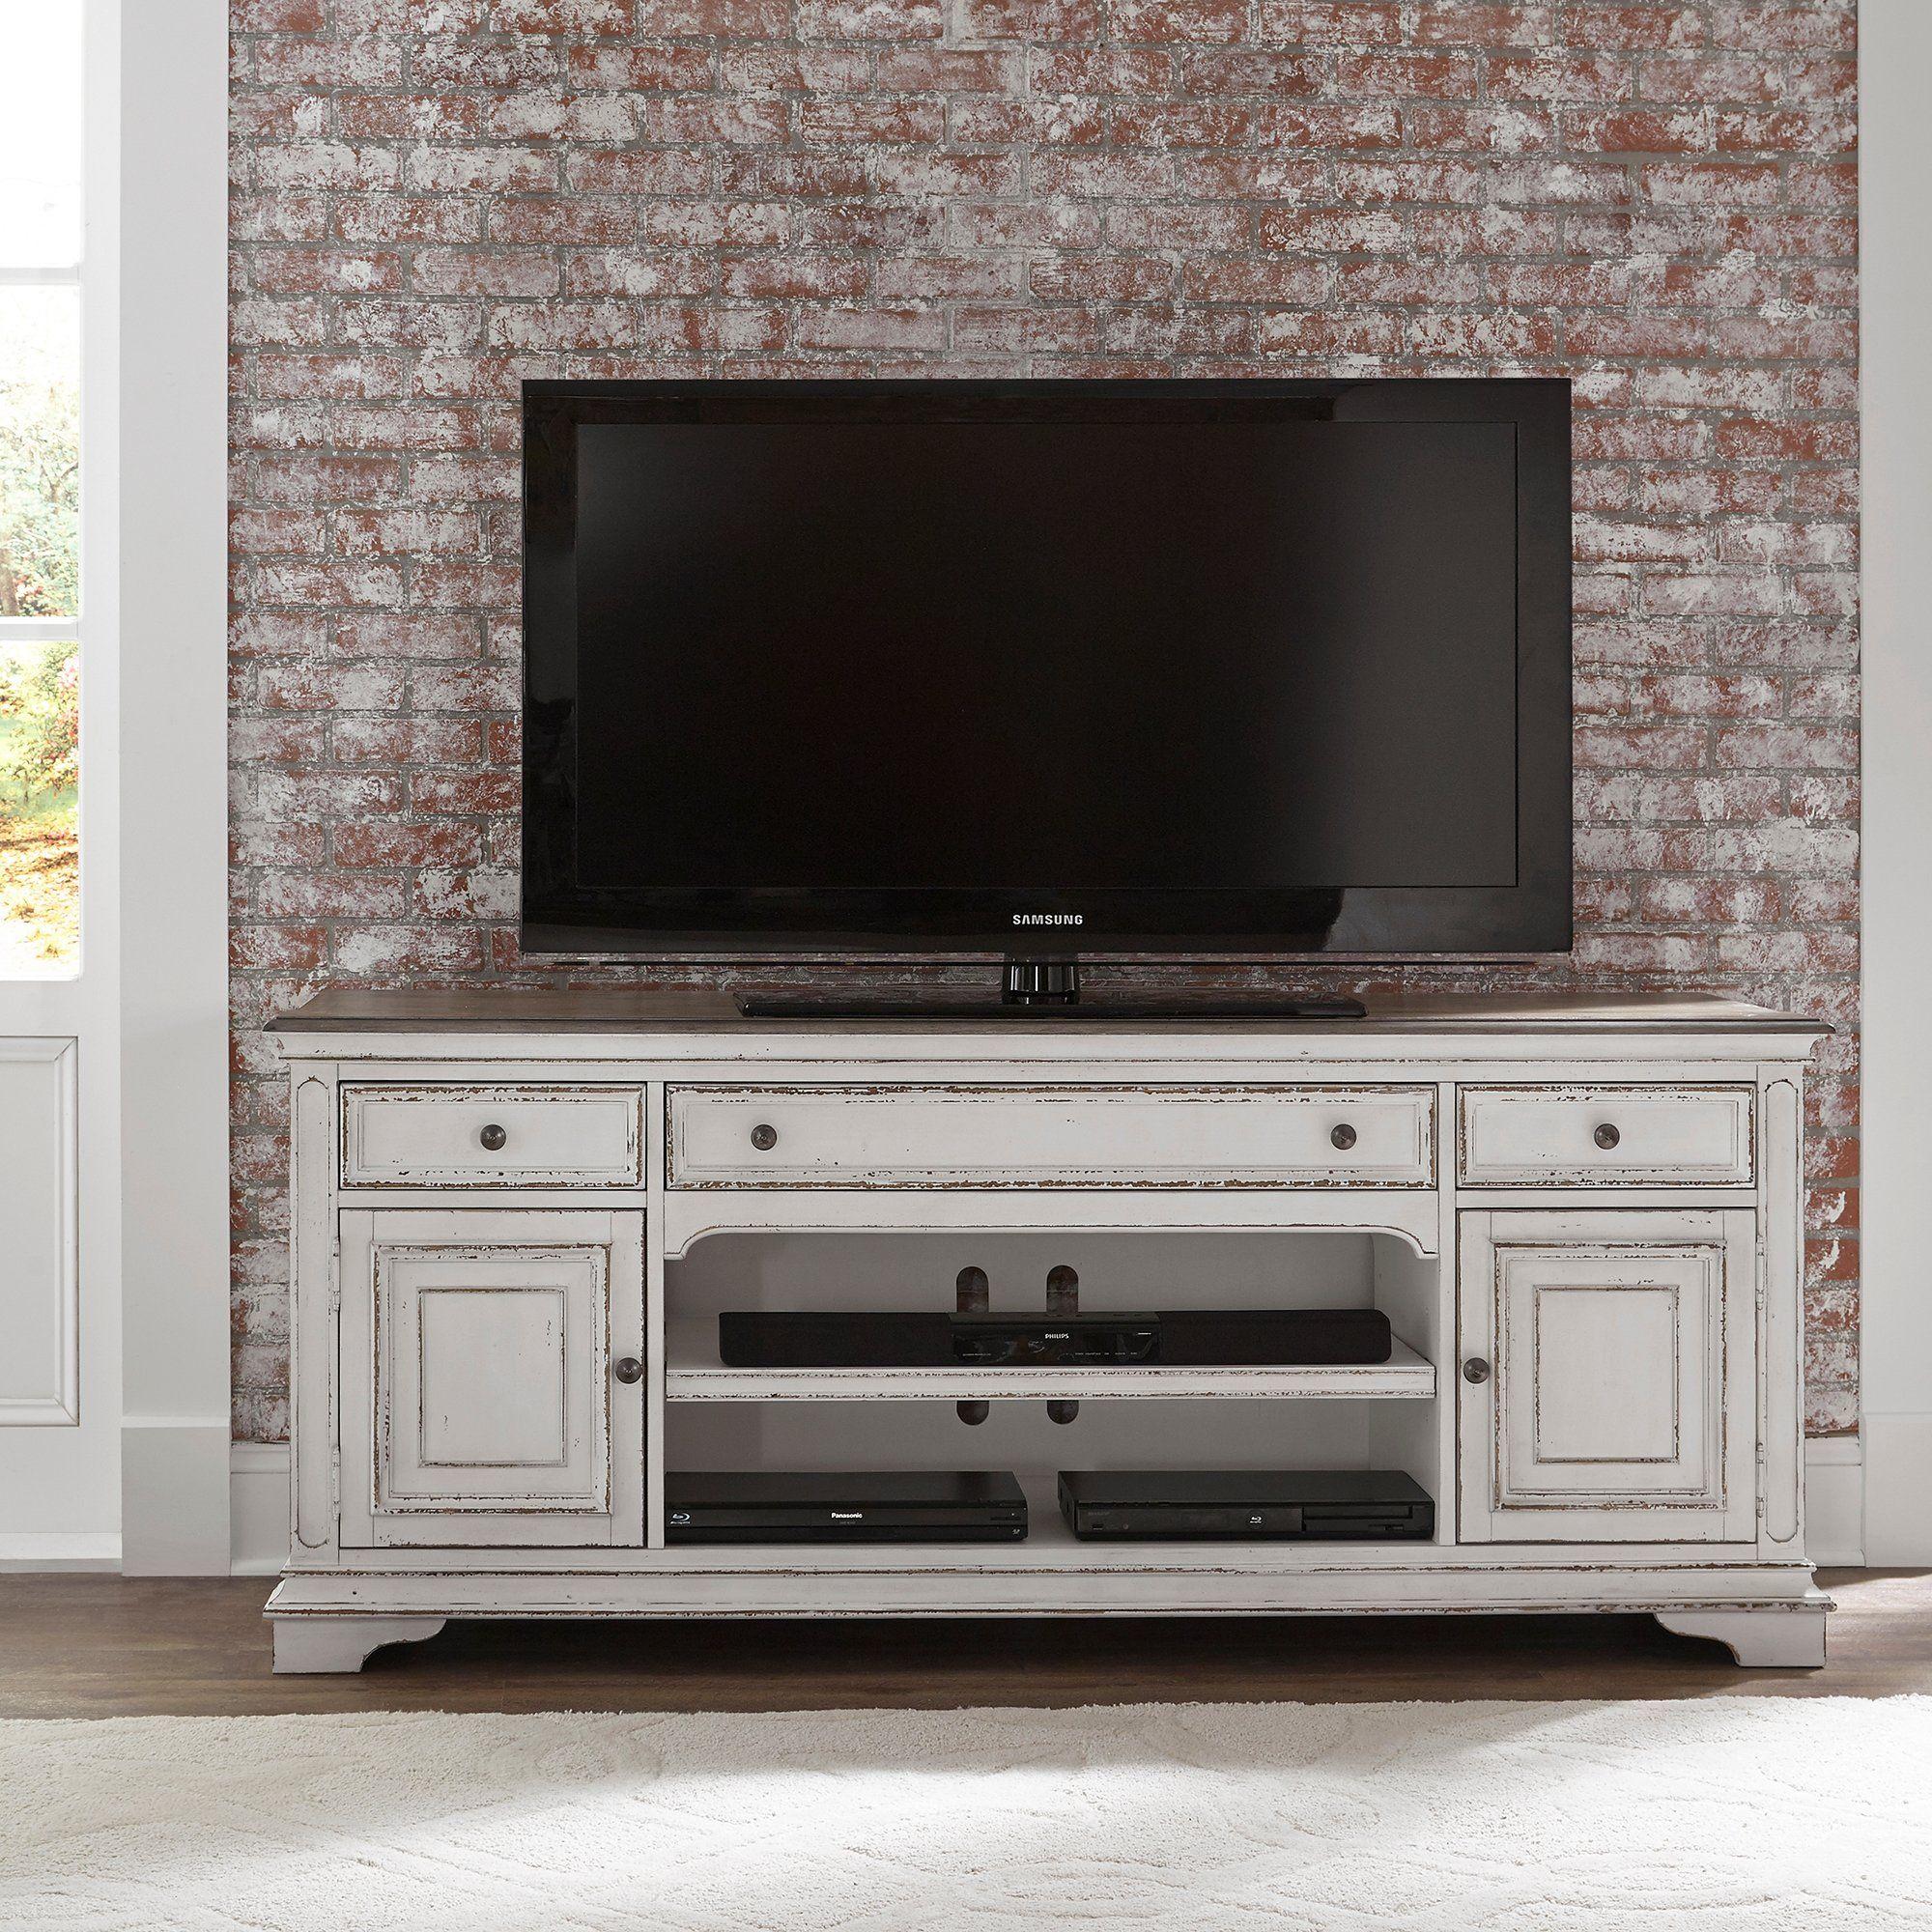 Antique White 70 Inch Tv Stand Magnolia Manor Rc Willey 70 Inch Tv Stand Farmhouse Tv Stand Tv Stand